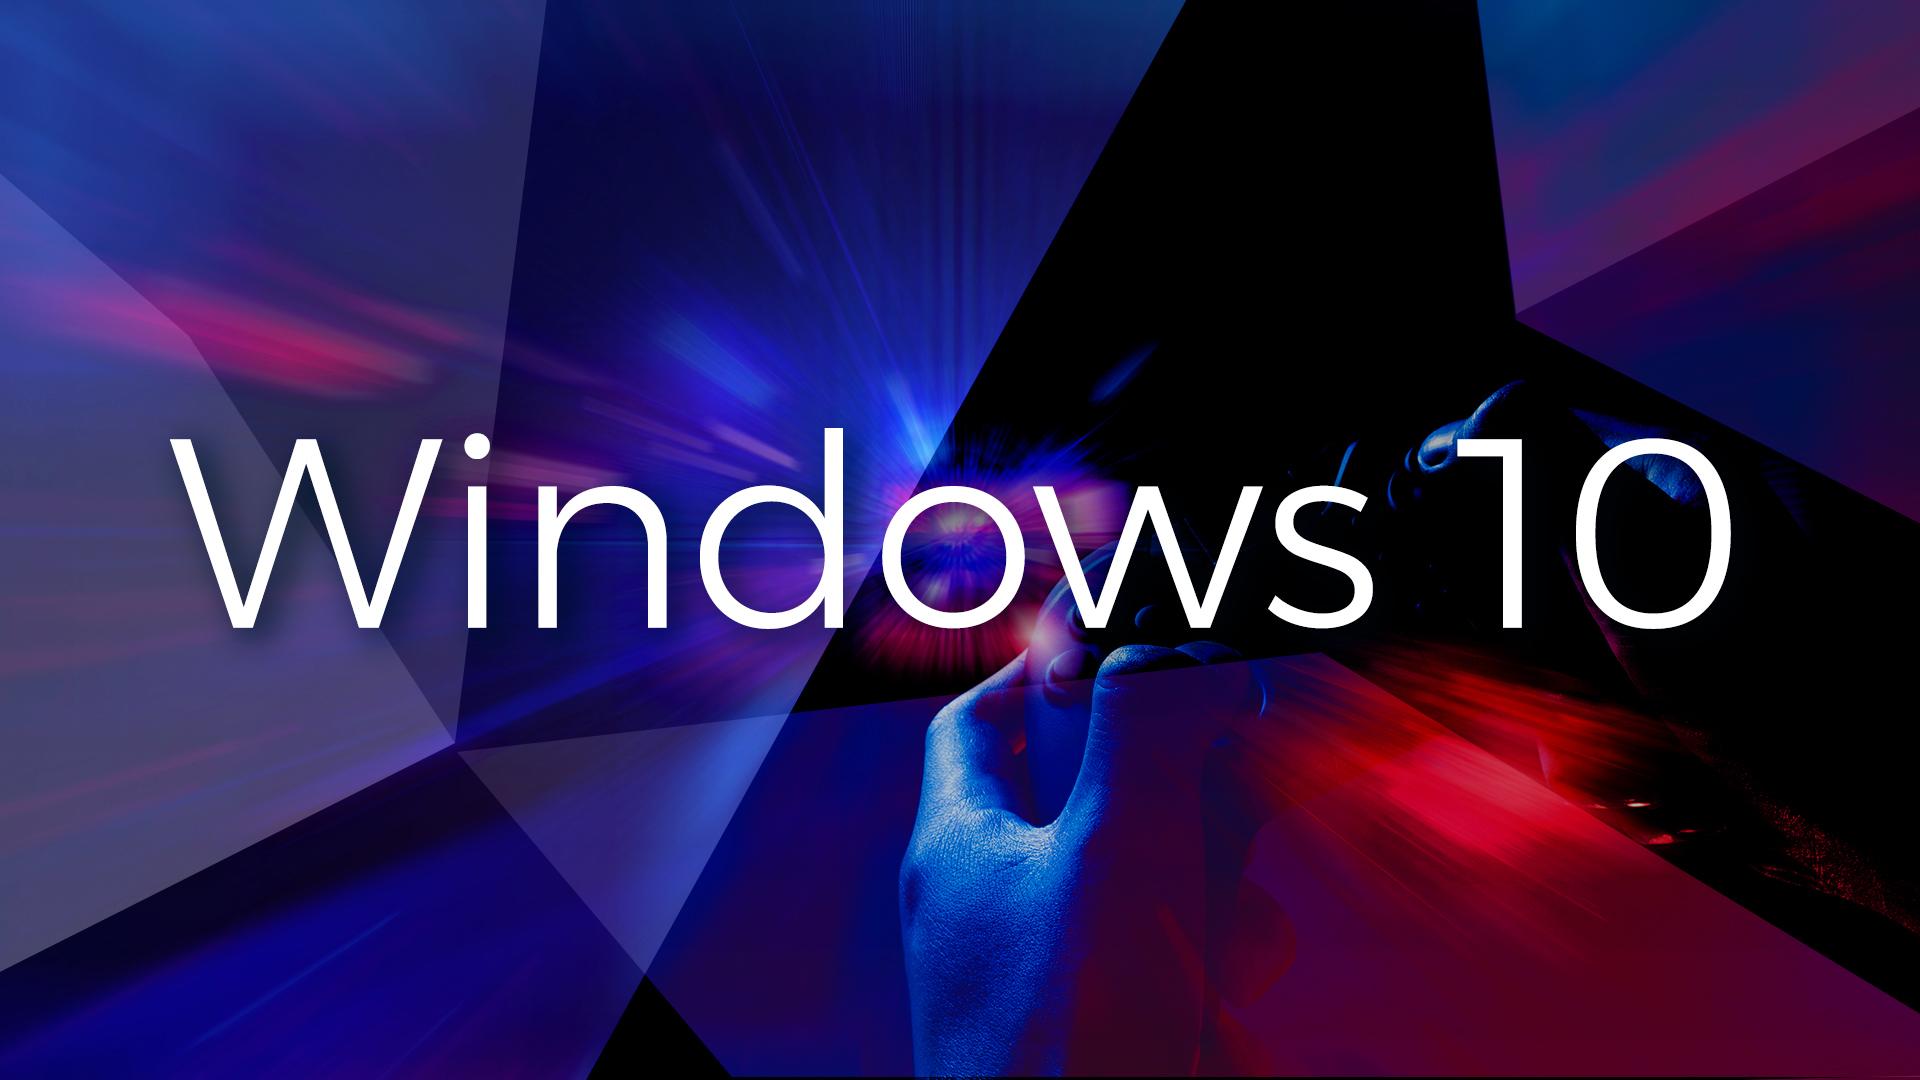 Windows 10, Gaming, Spiele, Games, Controller, Game, Videospiele, Microsoft Windows 10